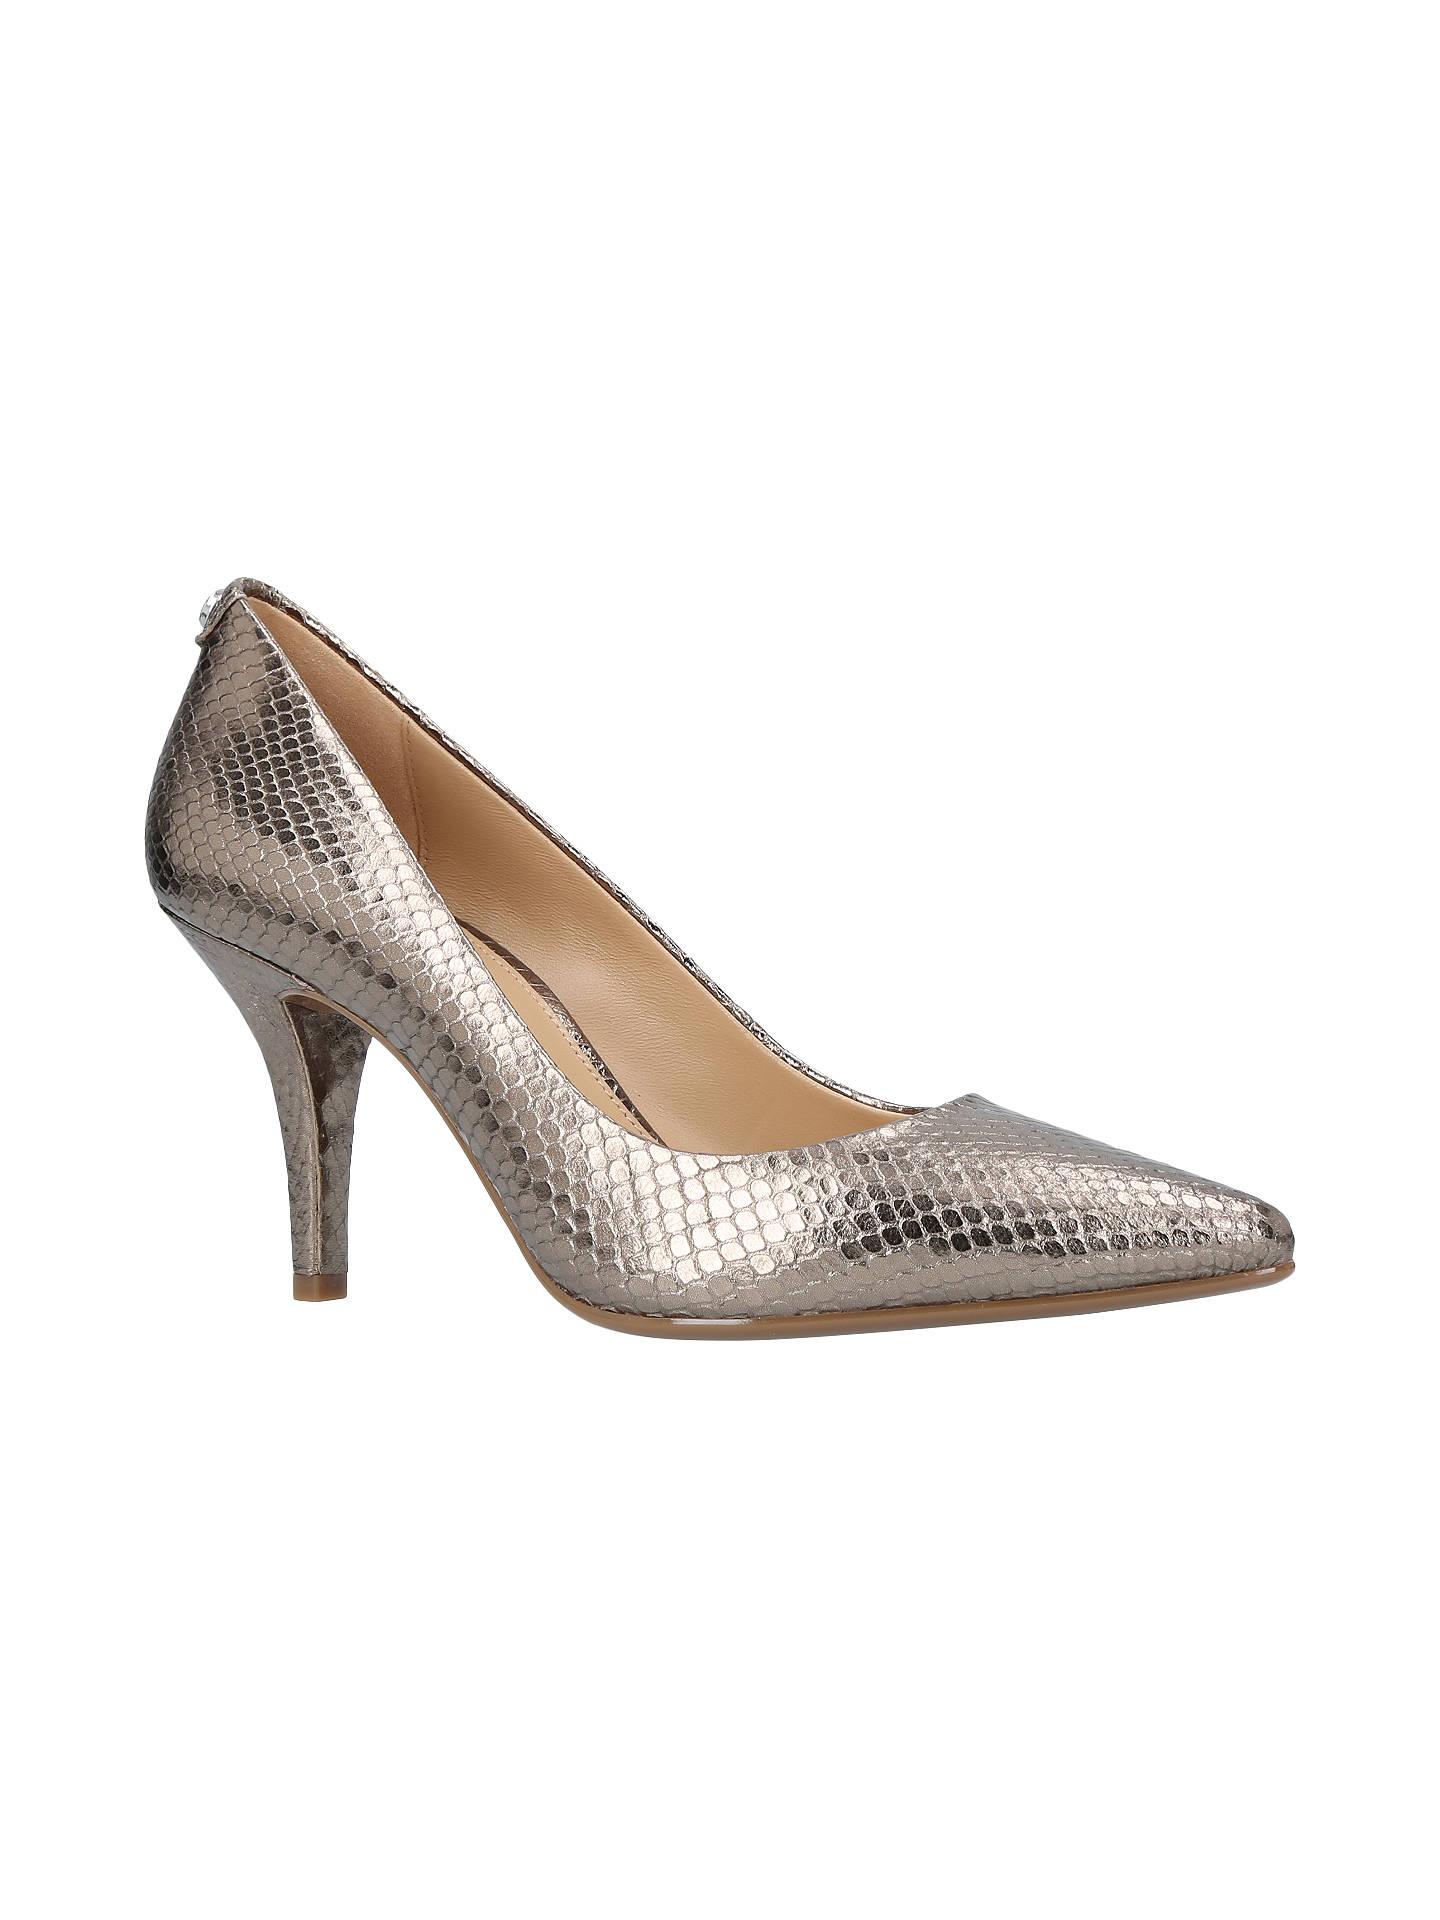 c5d6620b87f MICHAEL Michael Kors Flex High Heeled Stiletto Court Shoes, Silver ...